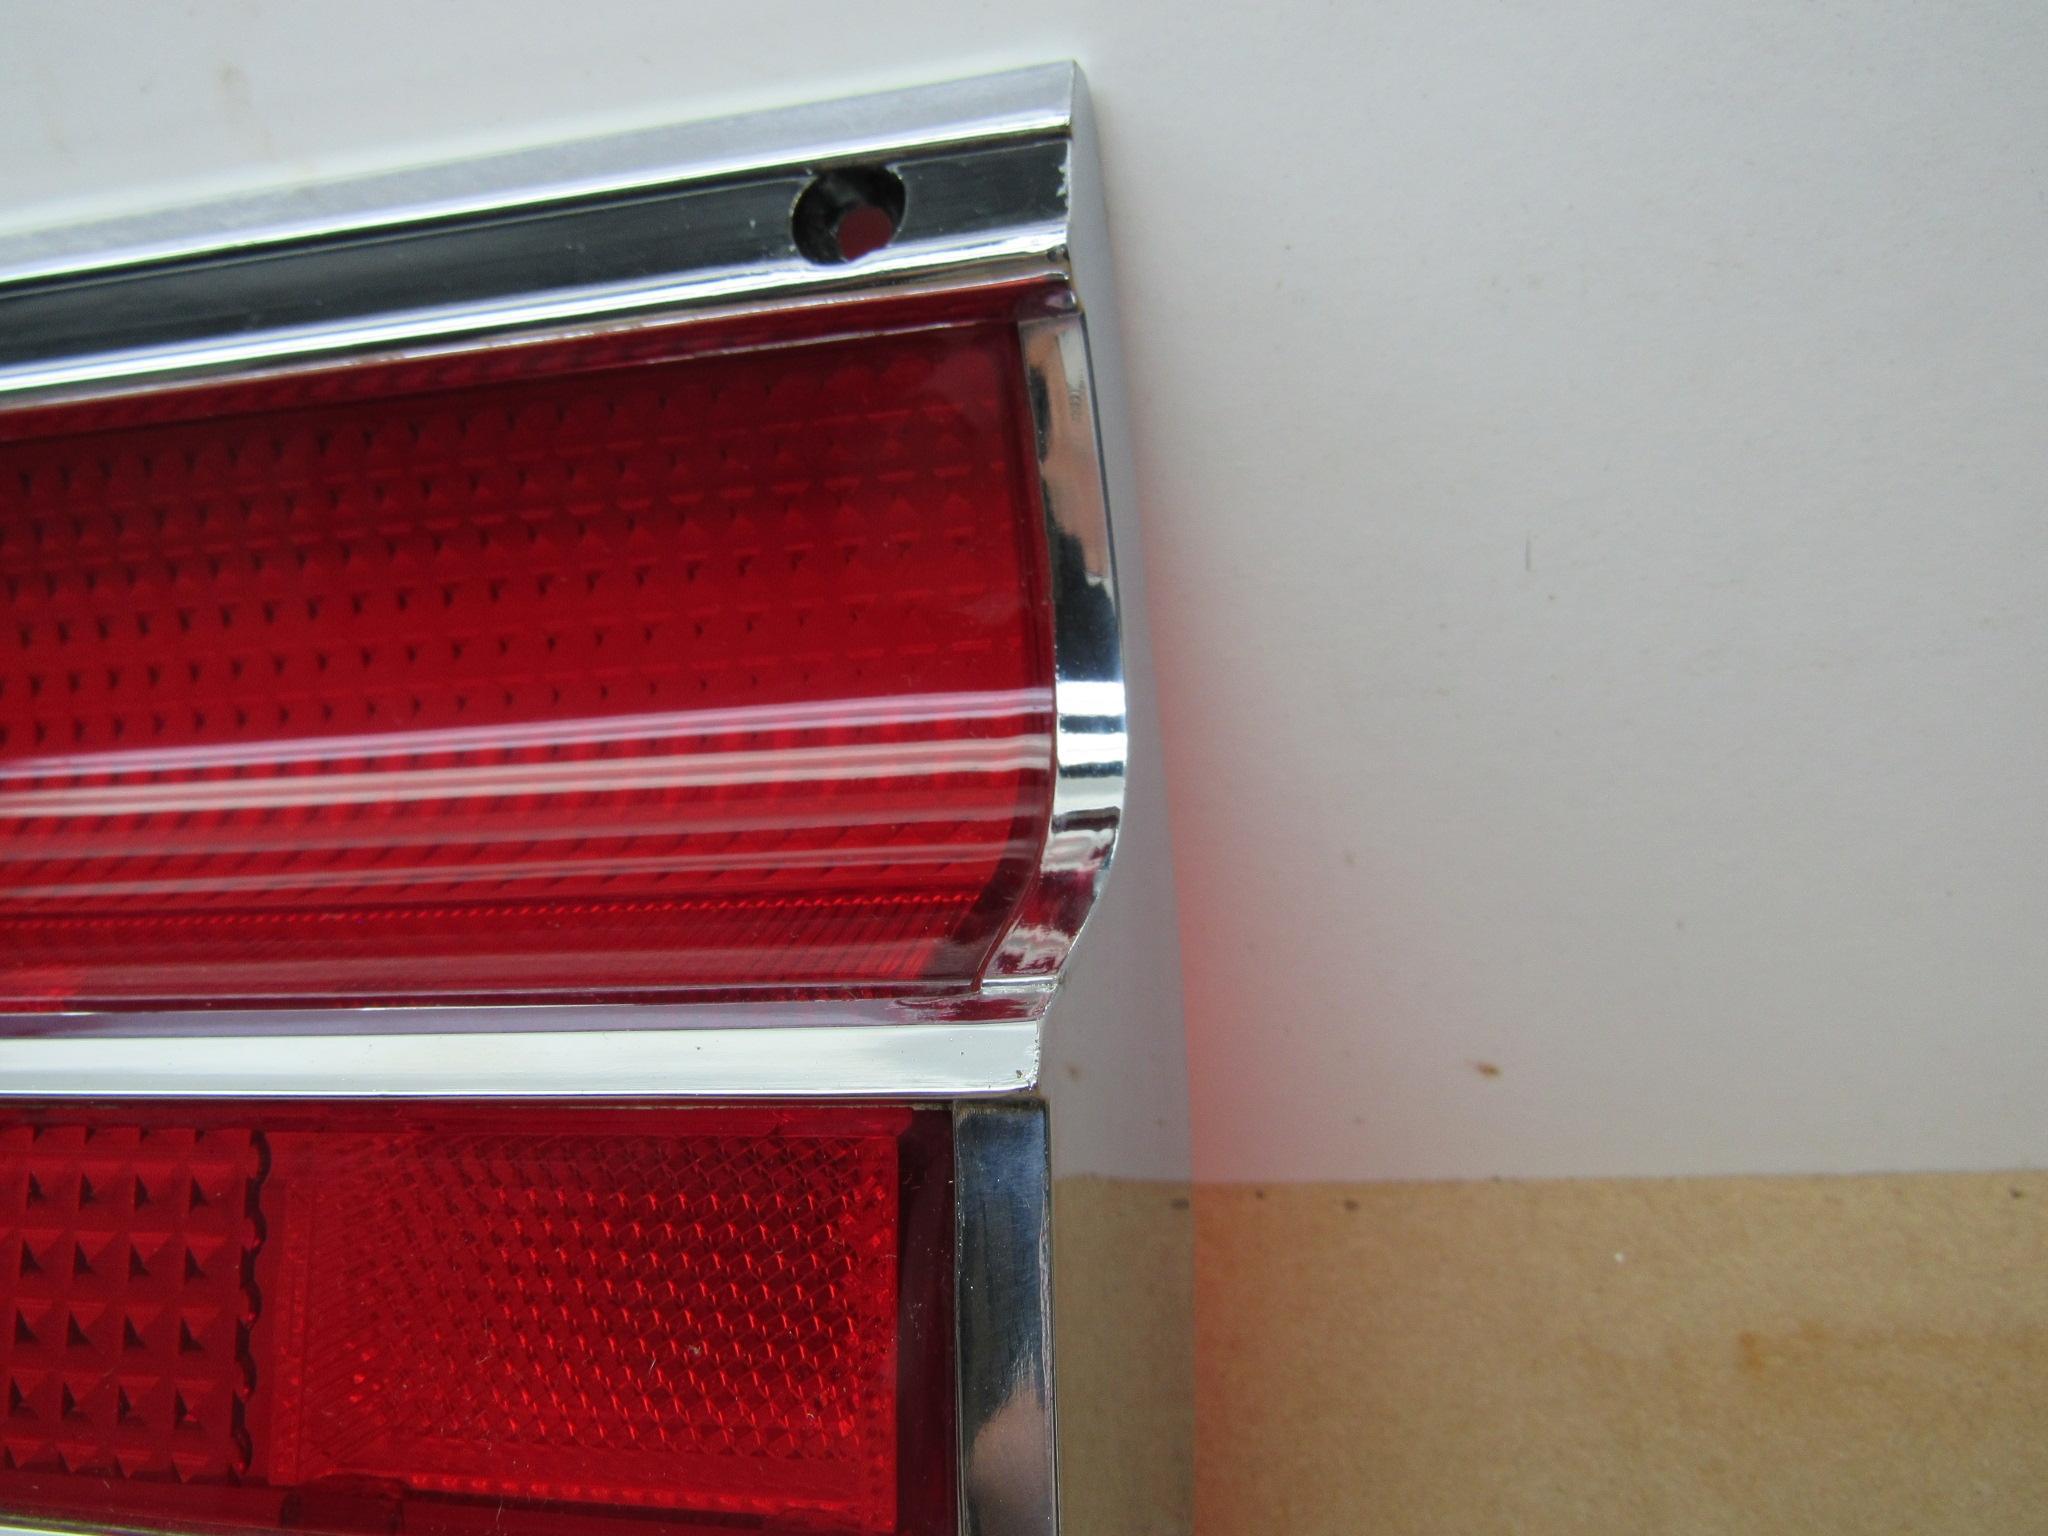 Imperial RN423AXBCR Rear Lamp